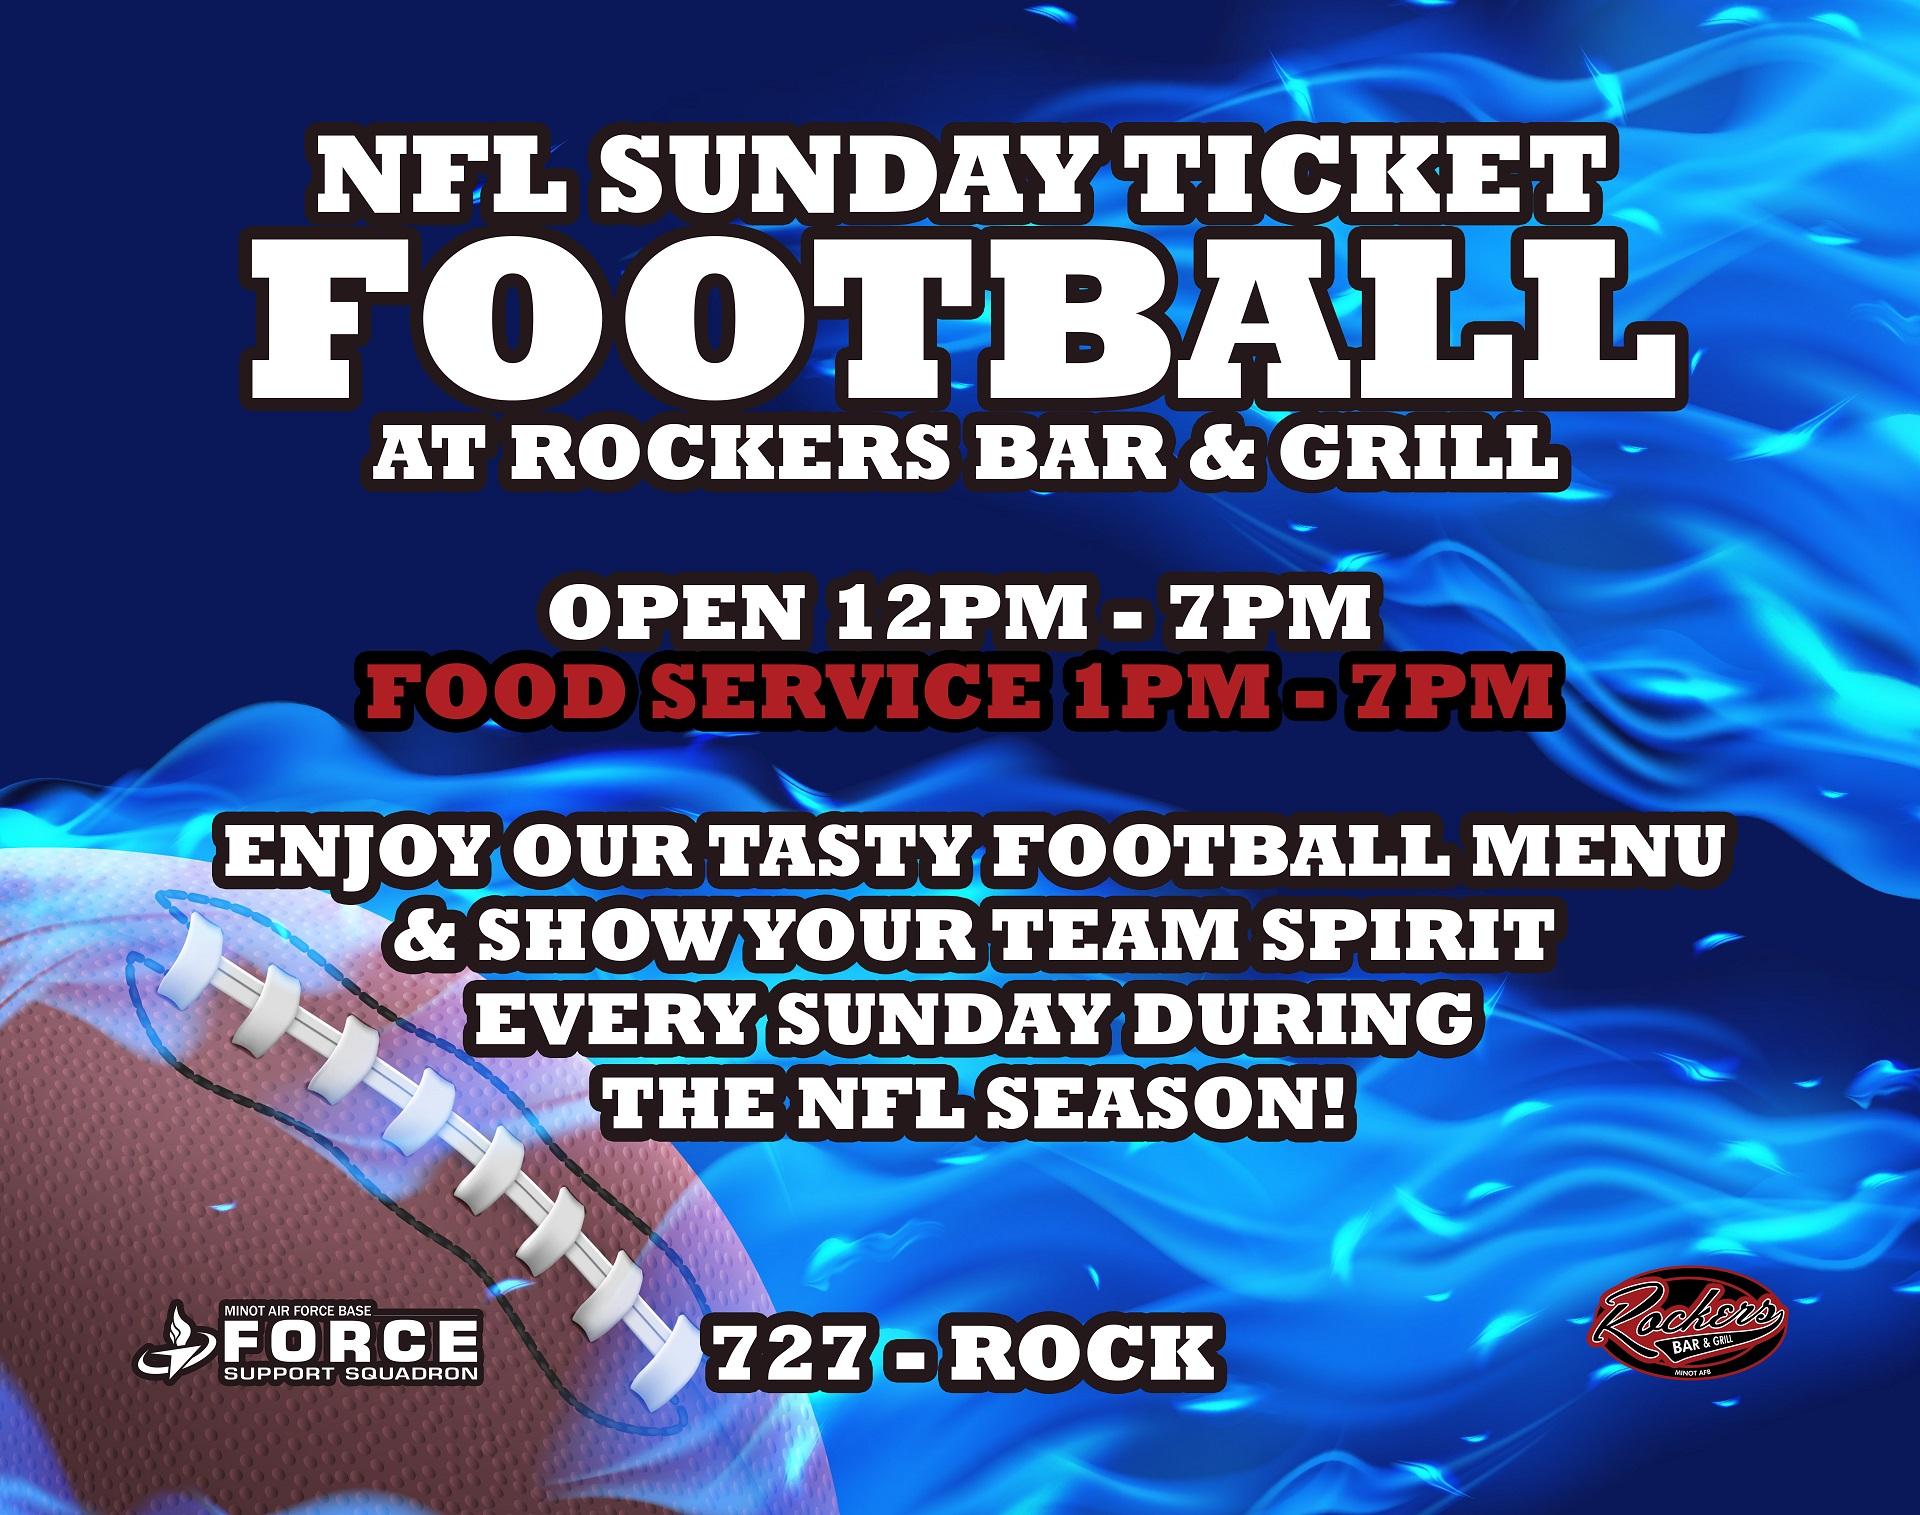 NFL Sunday Ticket